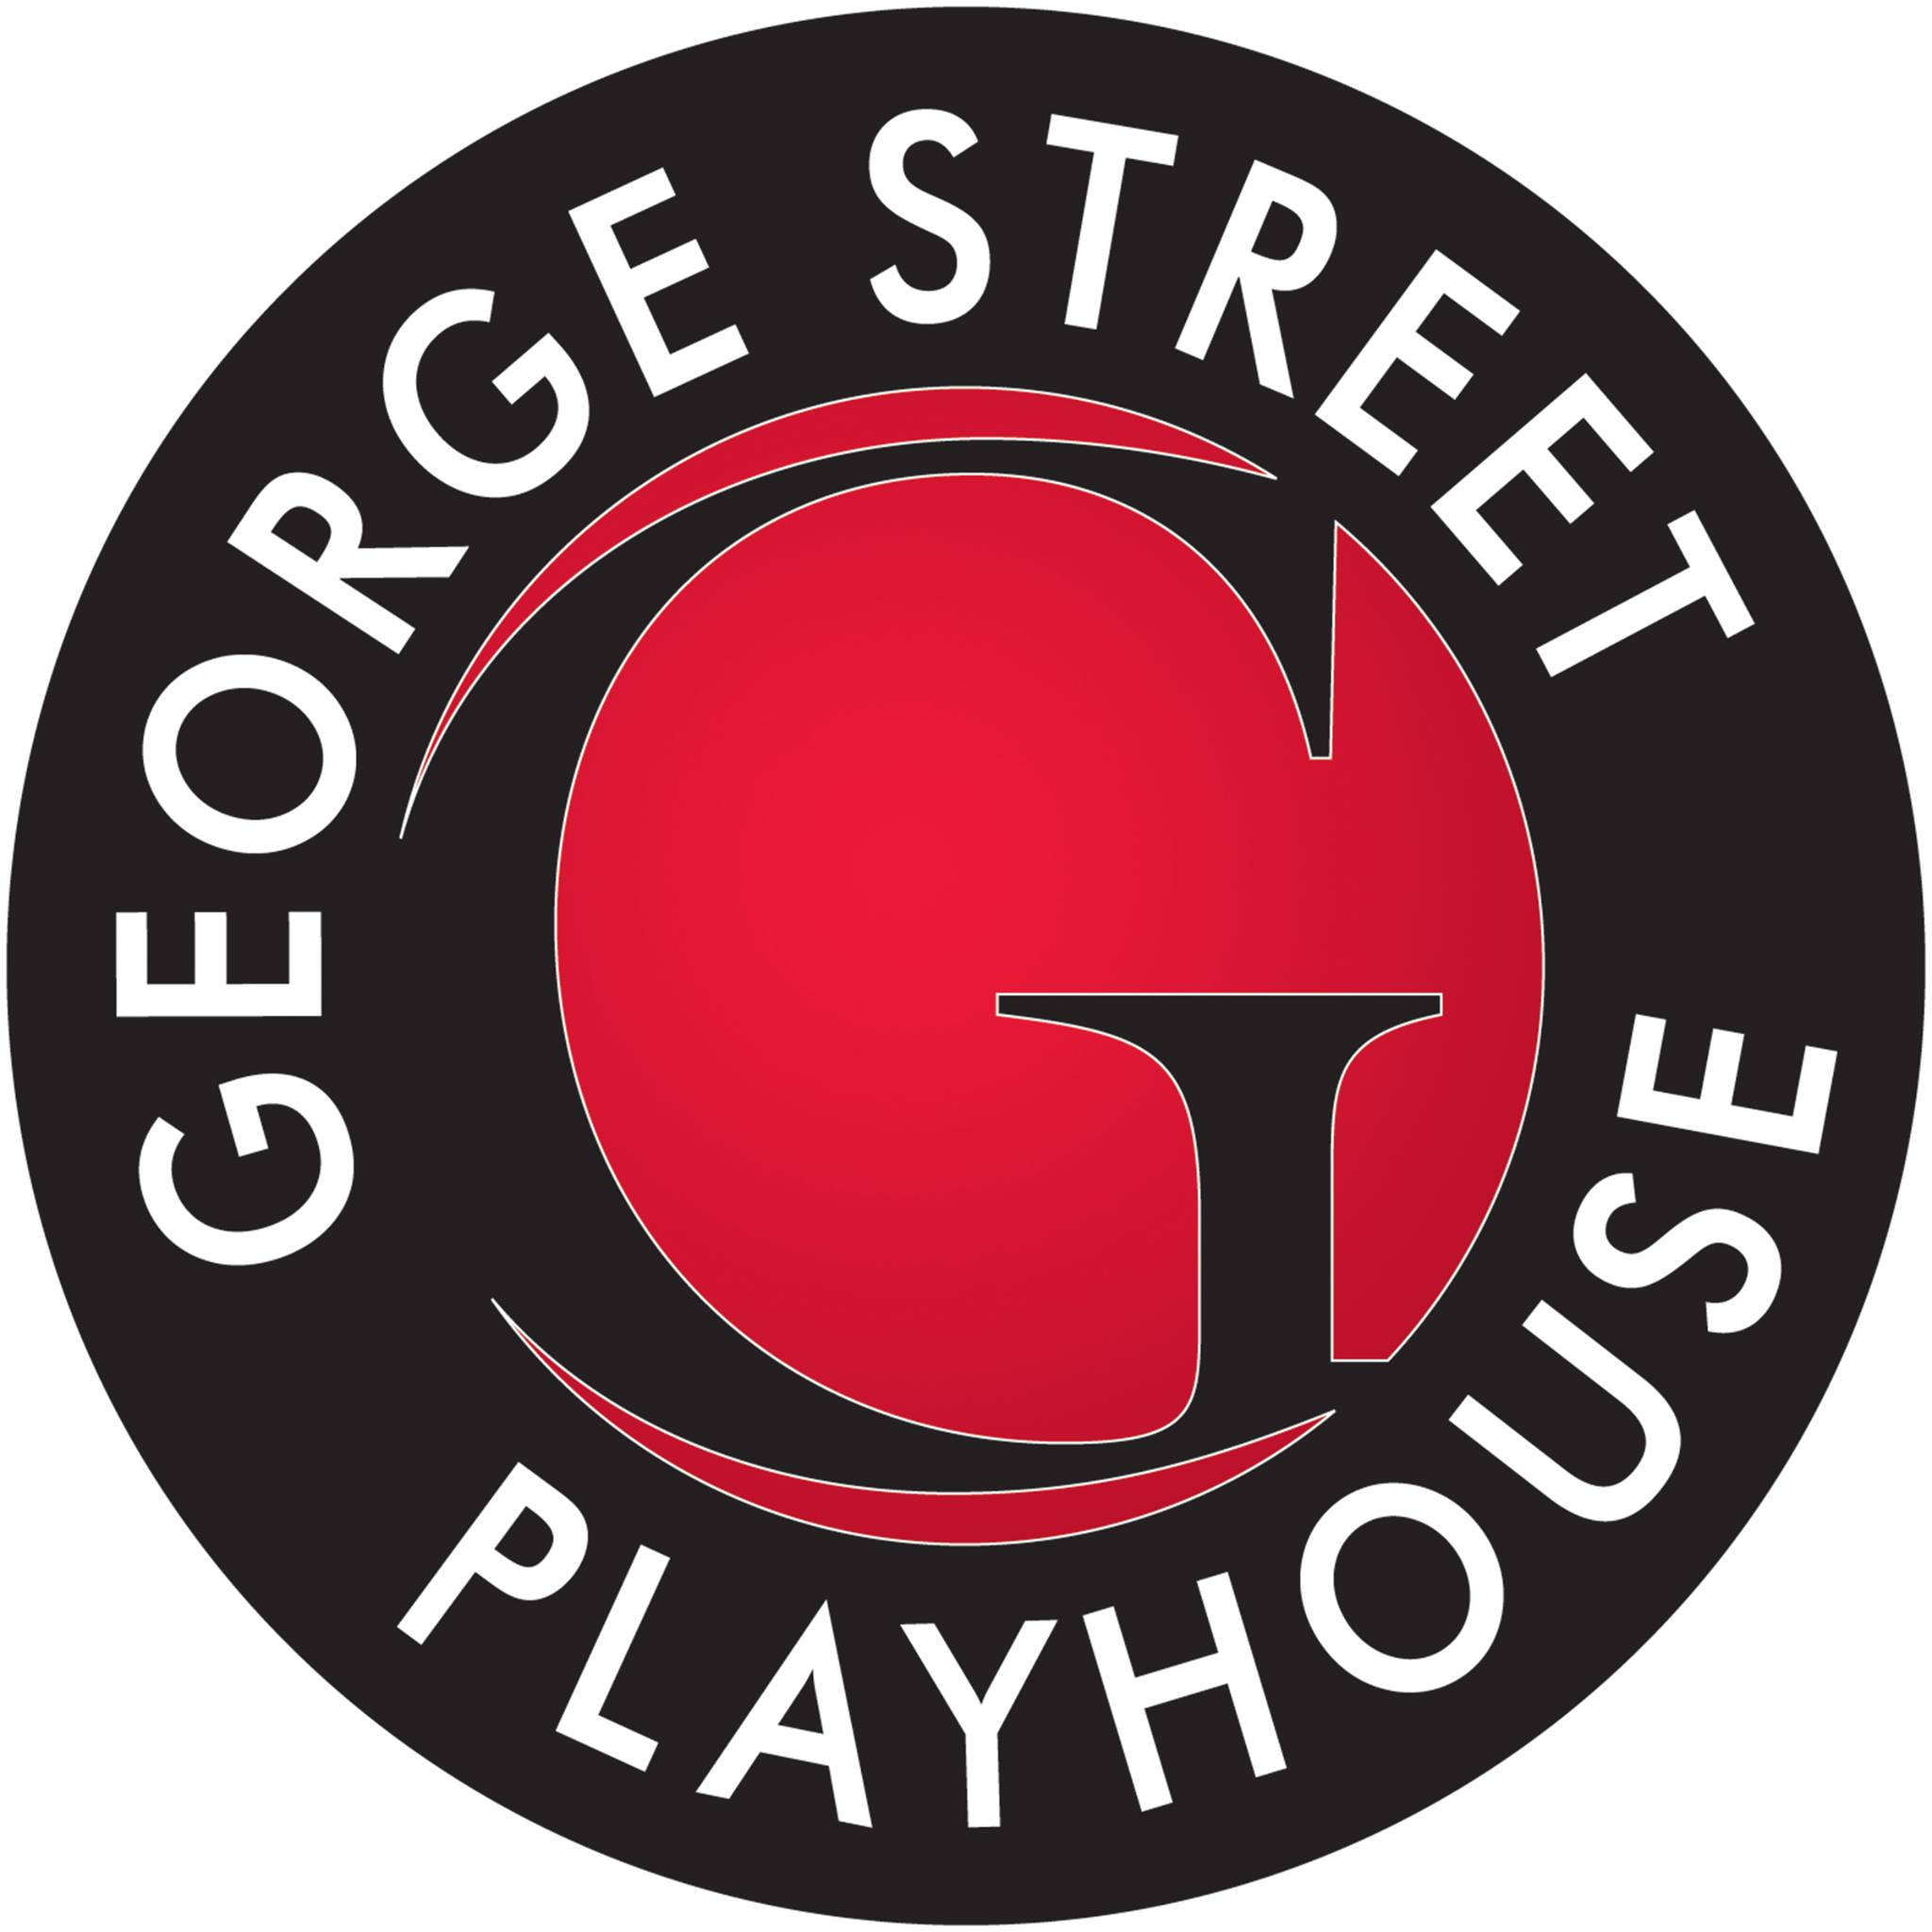 George Street Playhouse